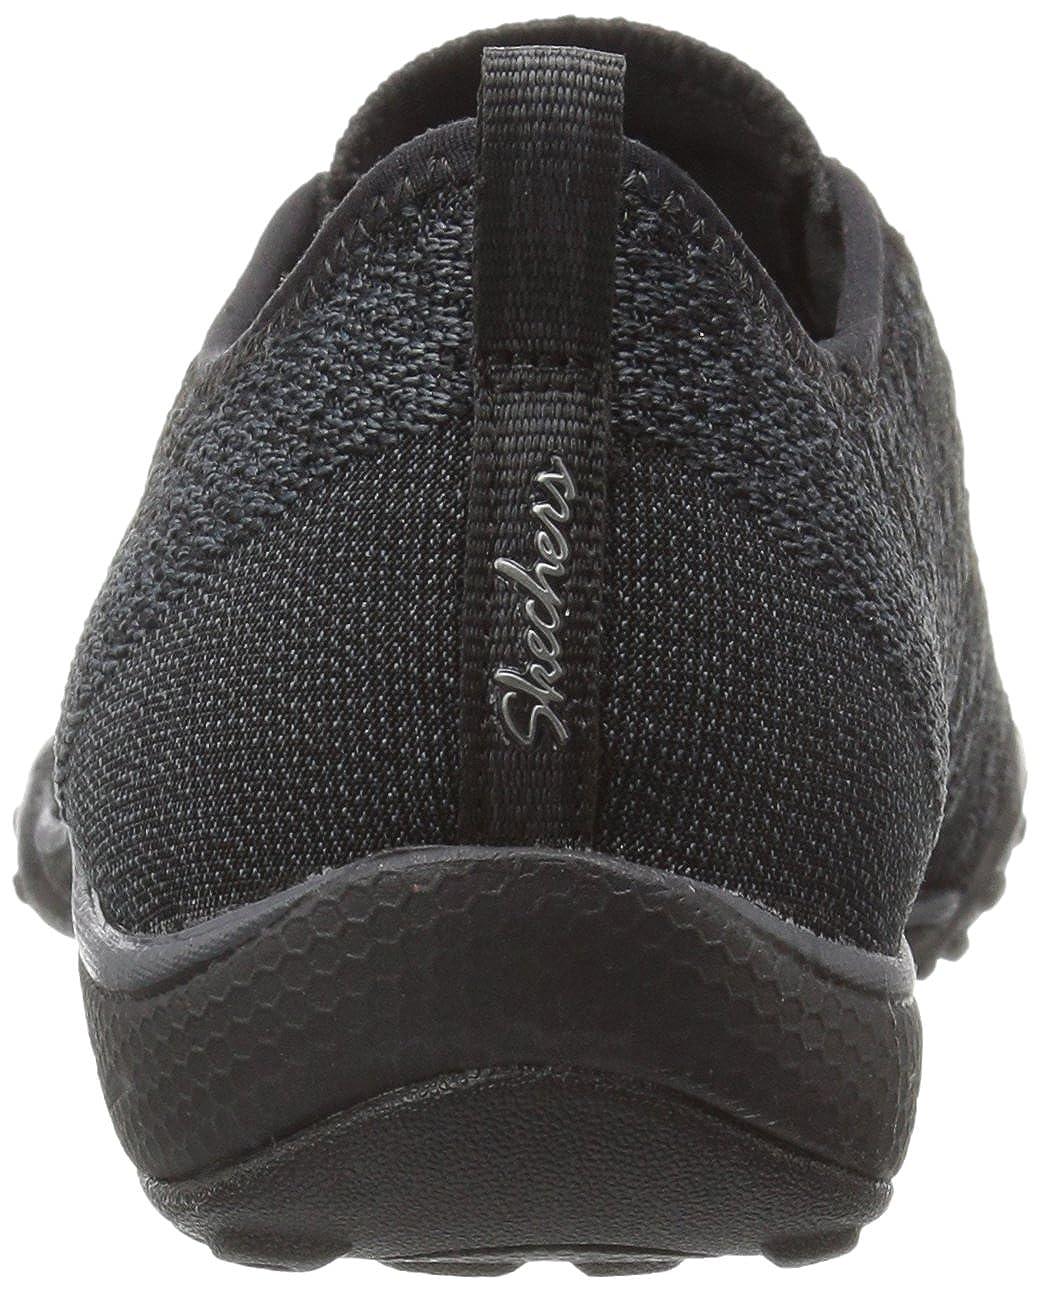 Skechers Breathe Easy-Fortune-Knit 23028 Zapatillas para Mujer